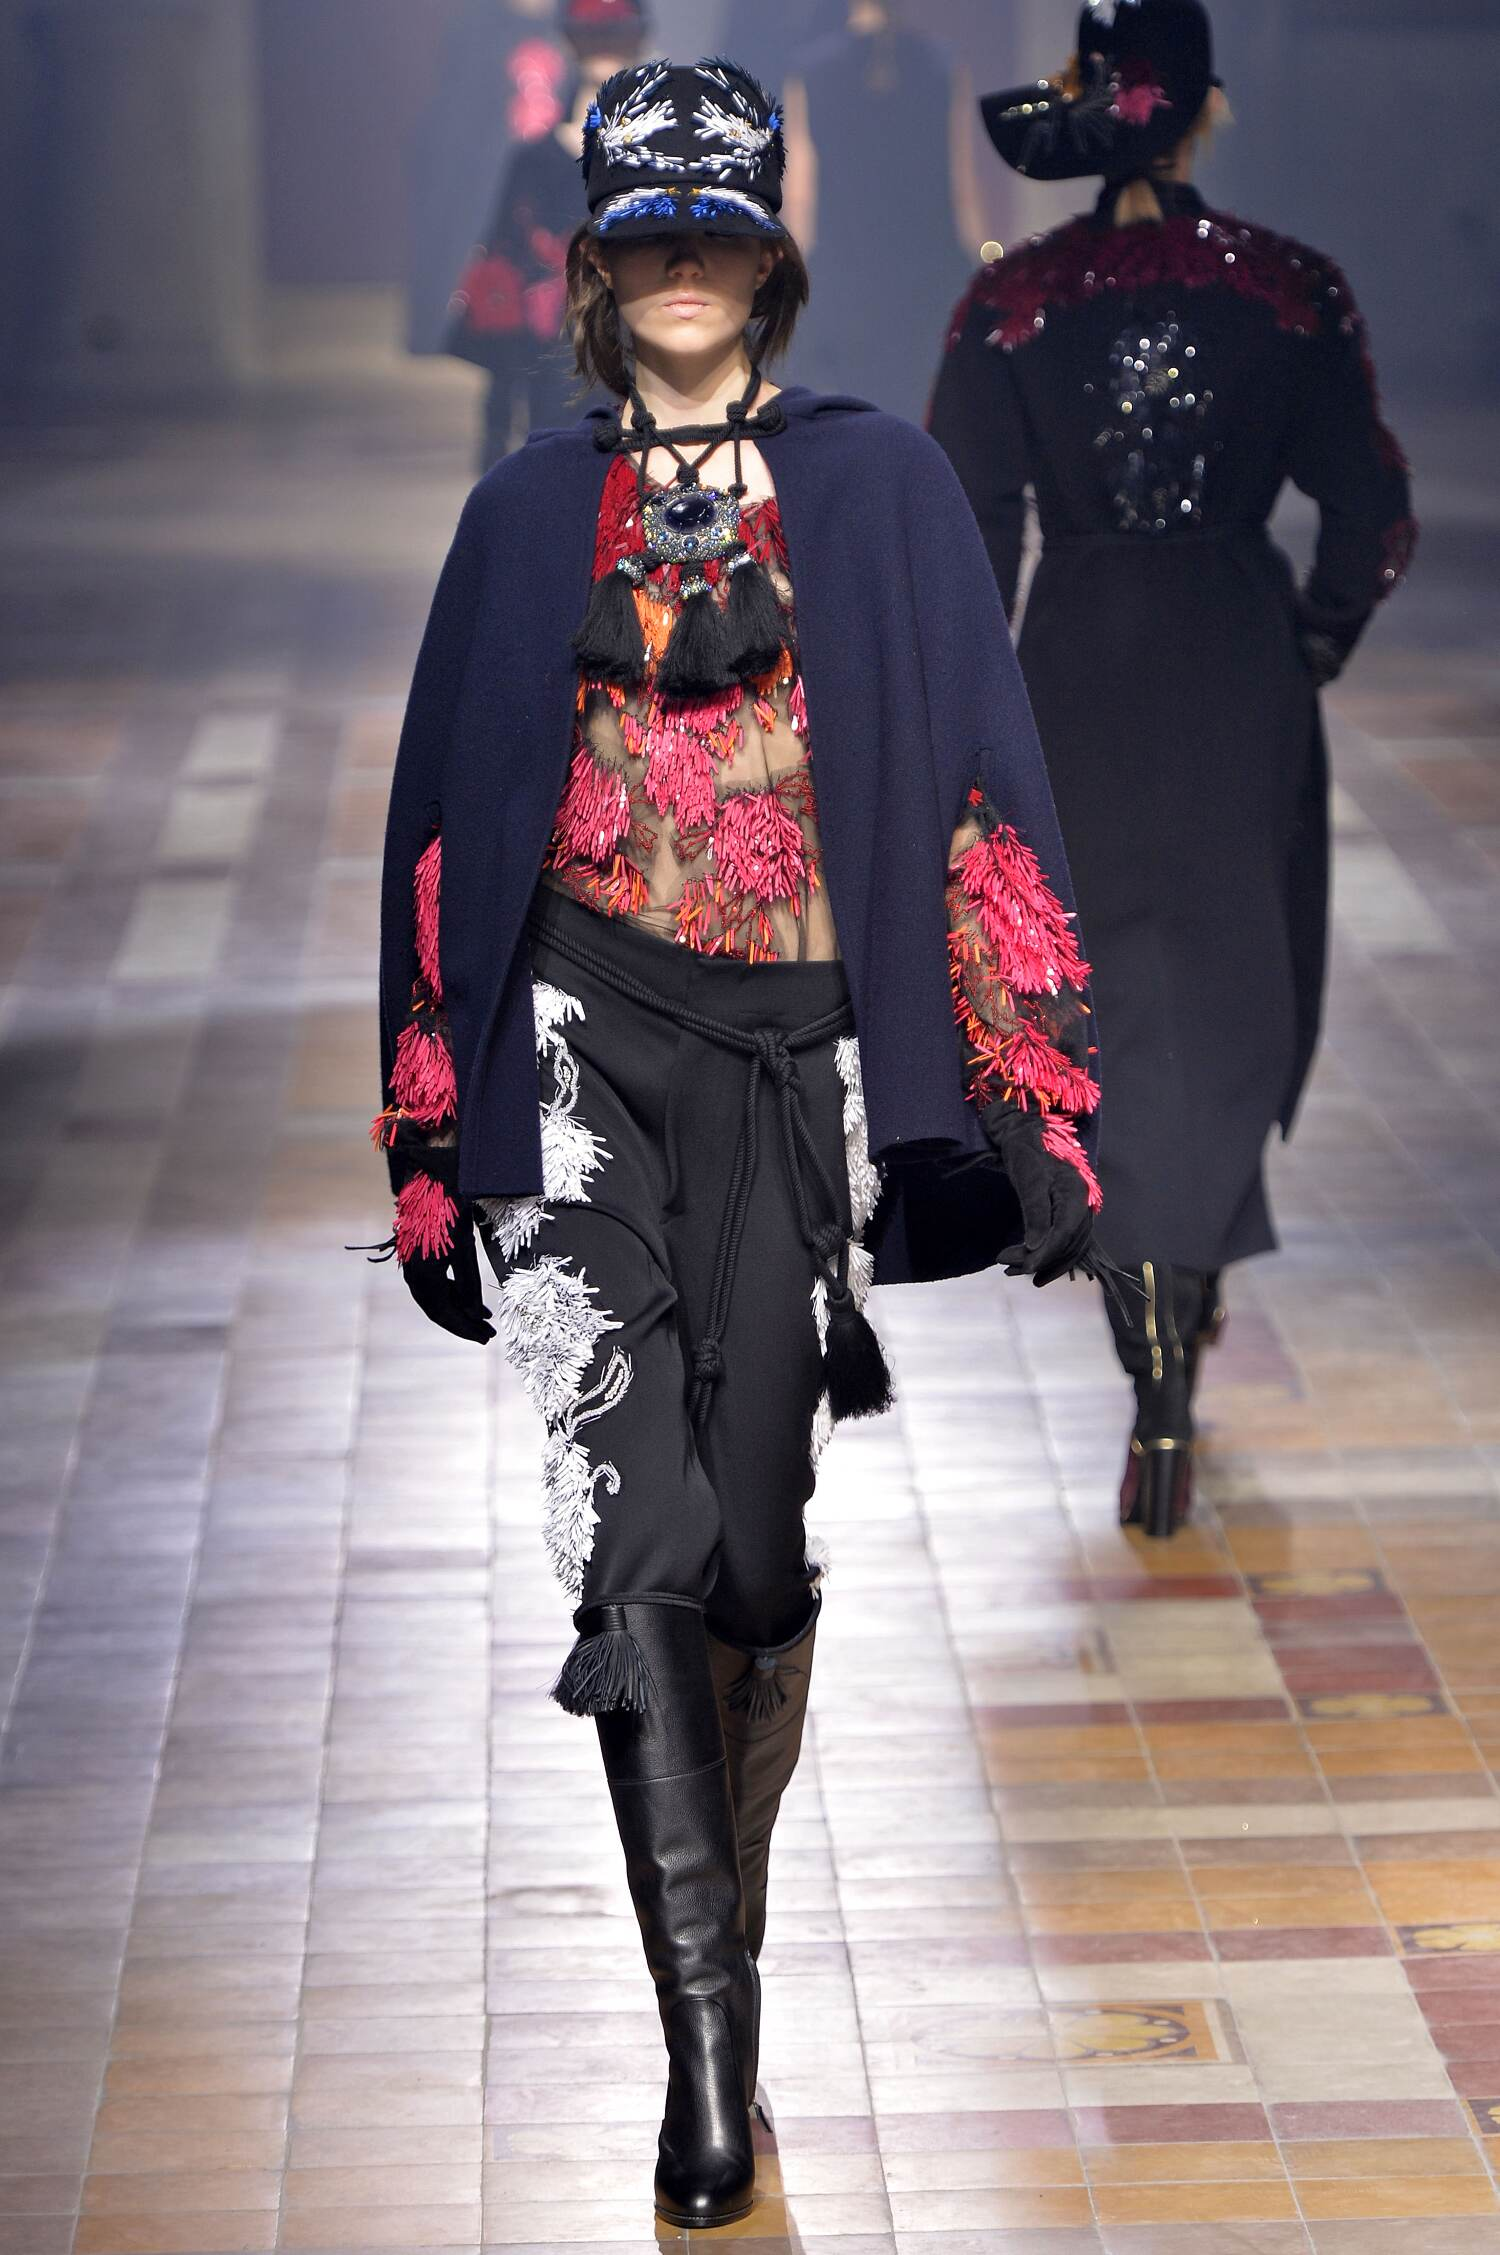 2015 Winter Fashion Show Lanvin Collection